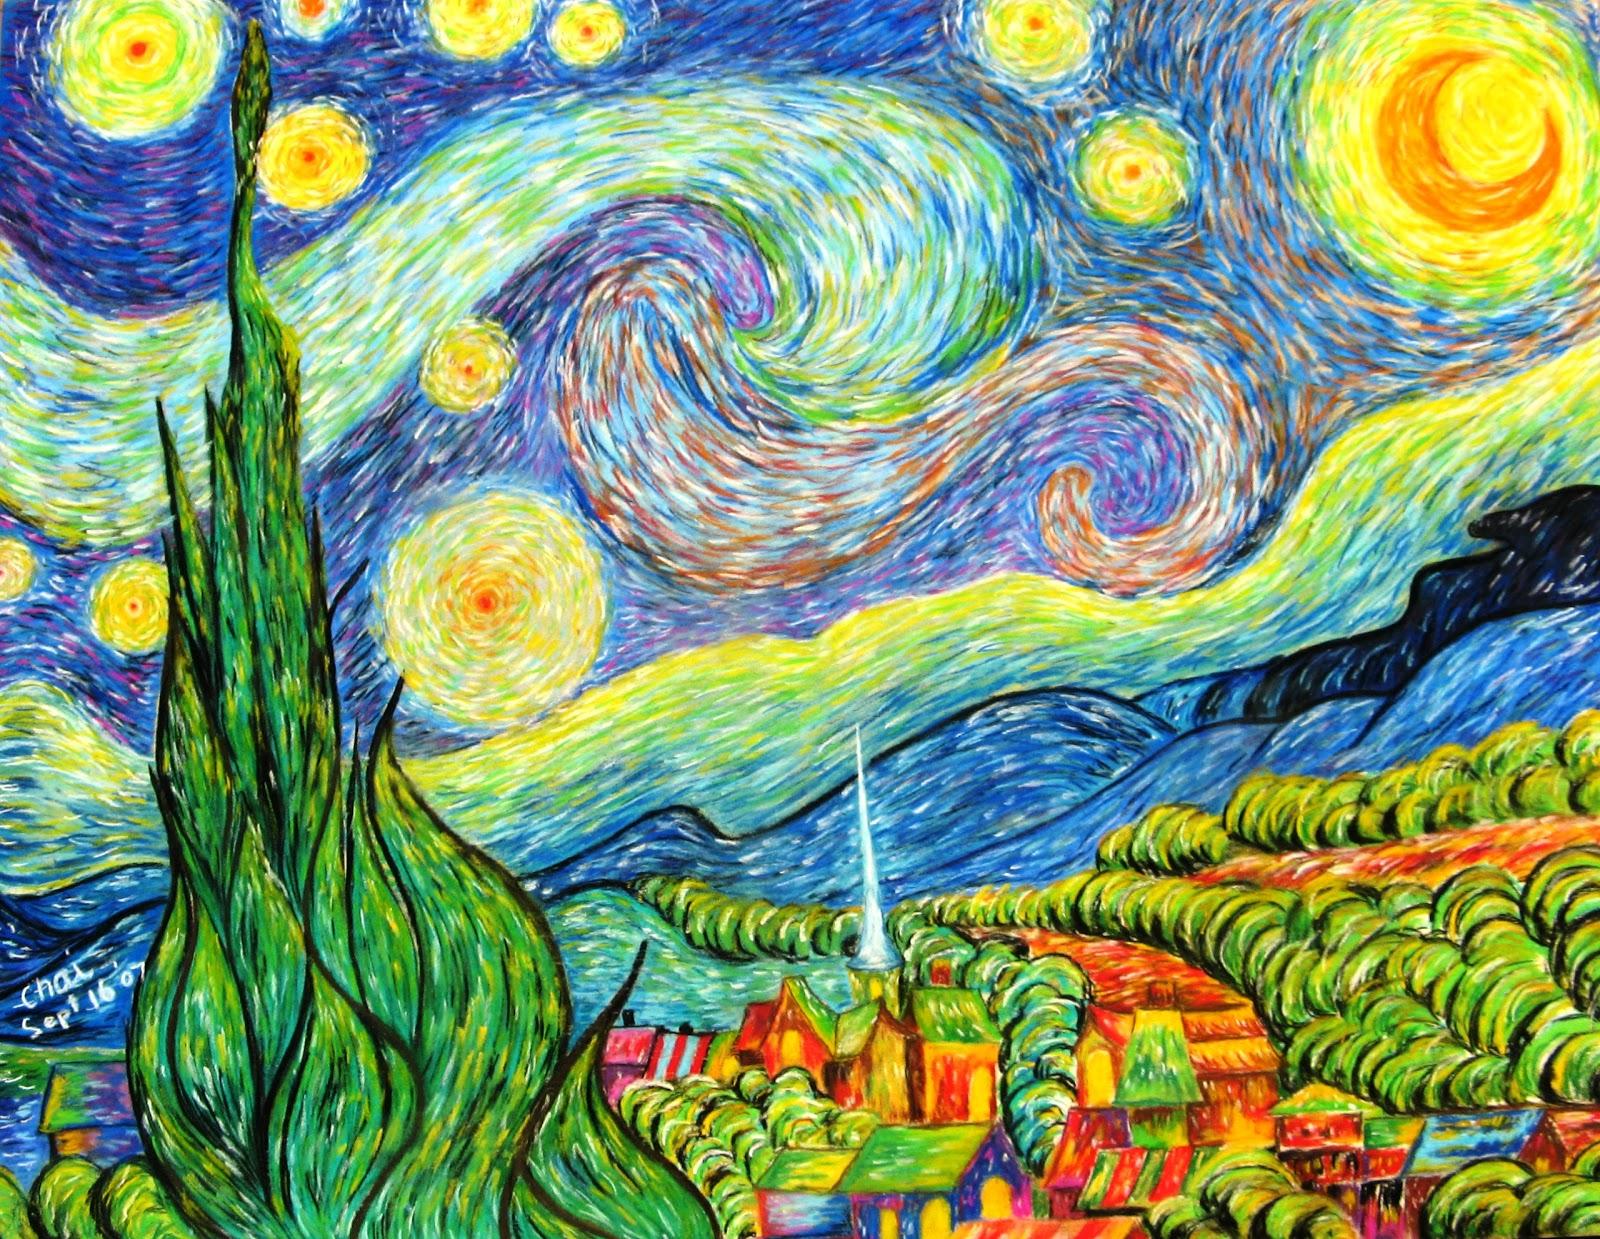 My Great Paintings Painting Parody Of Vincent Van Gogh S